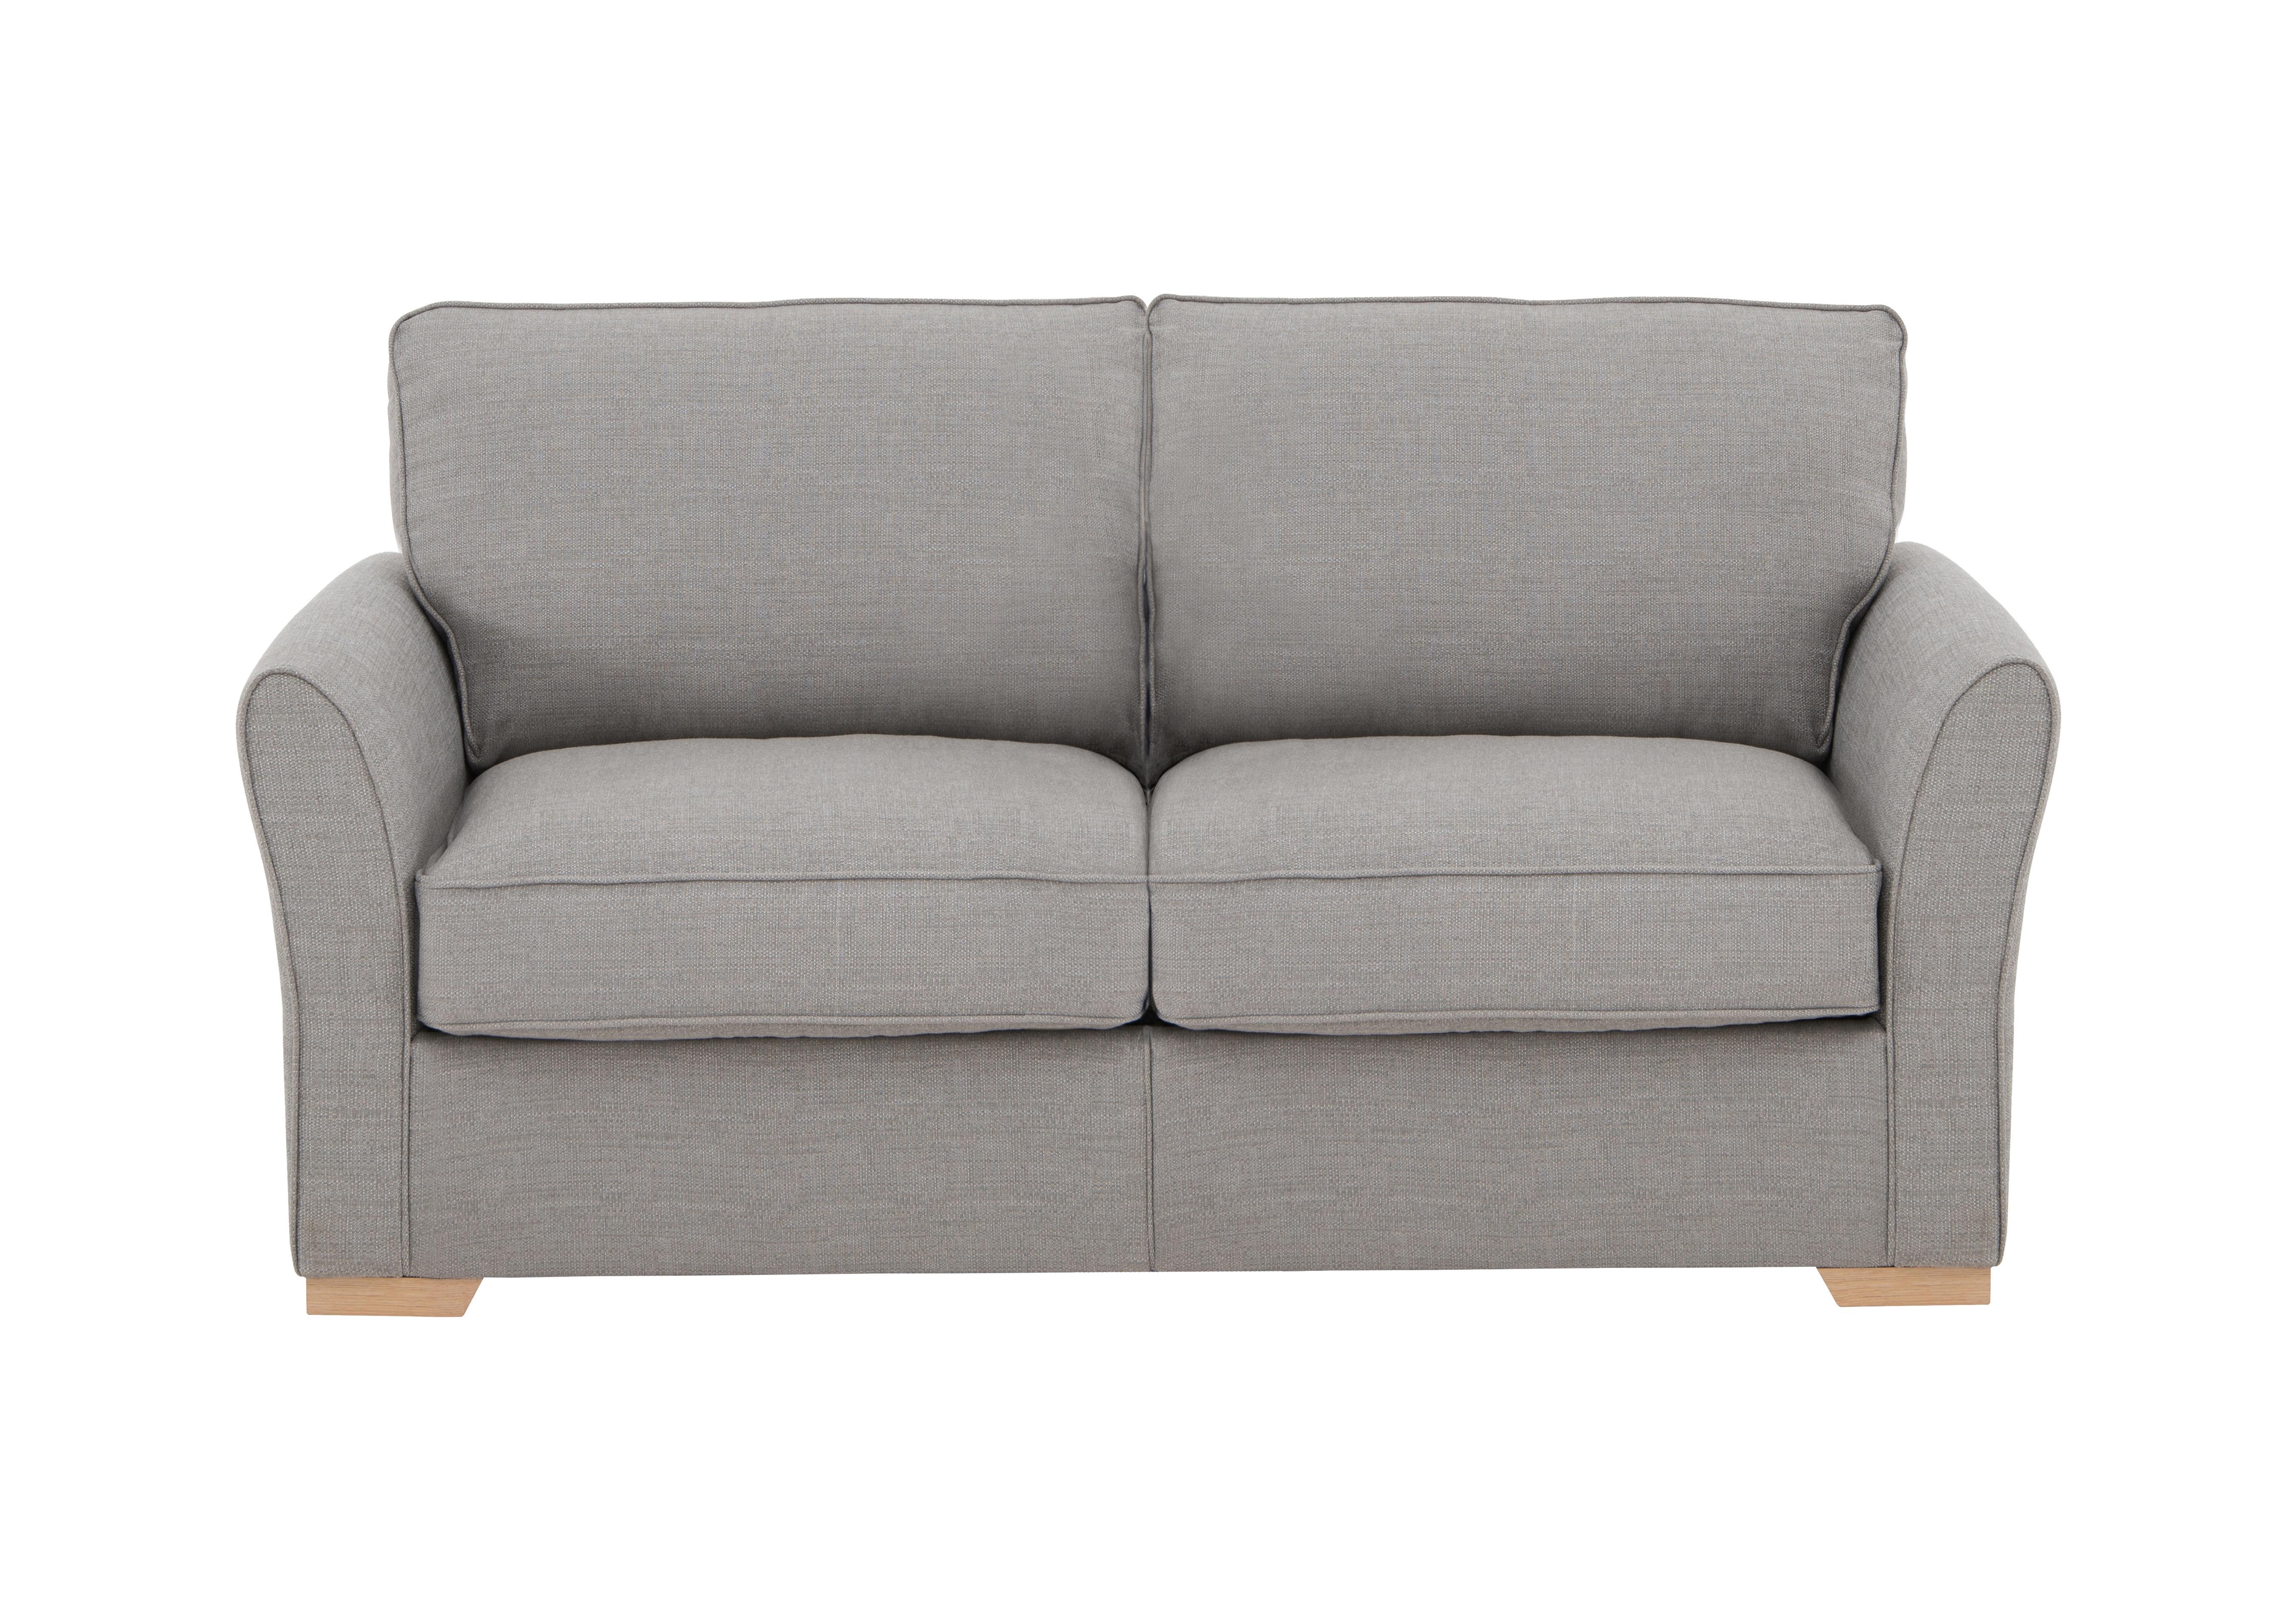 sofa bed world uk silentnight fusion 2 seater beds furniture village save 270